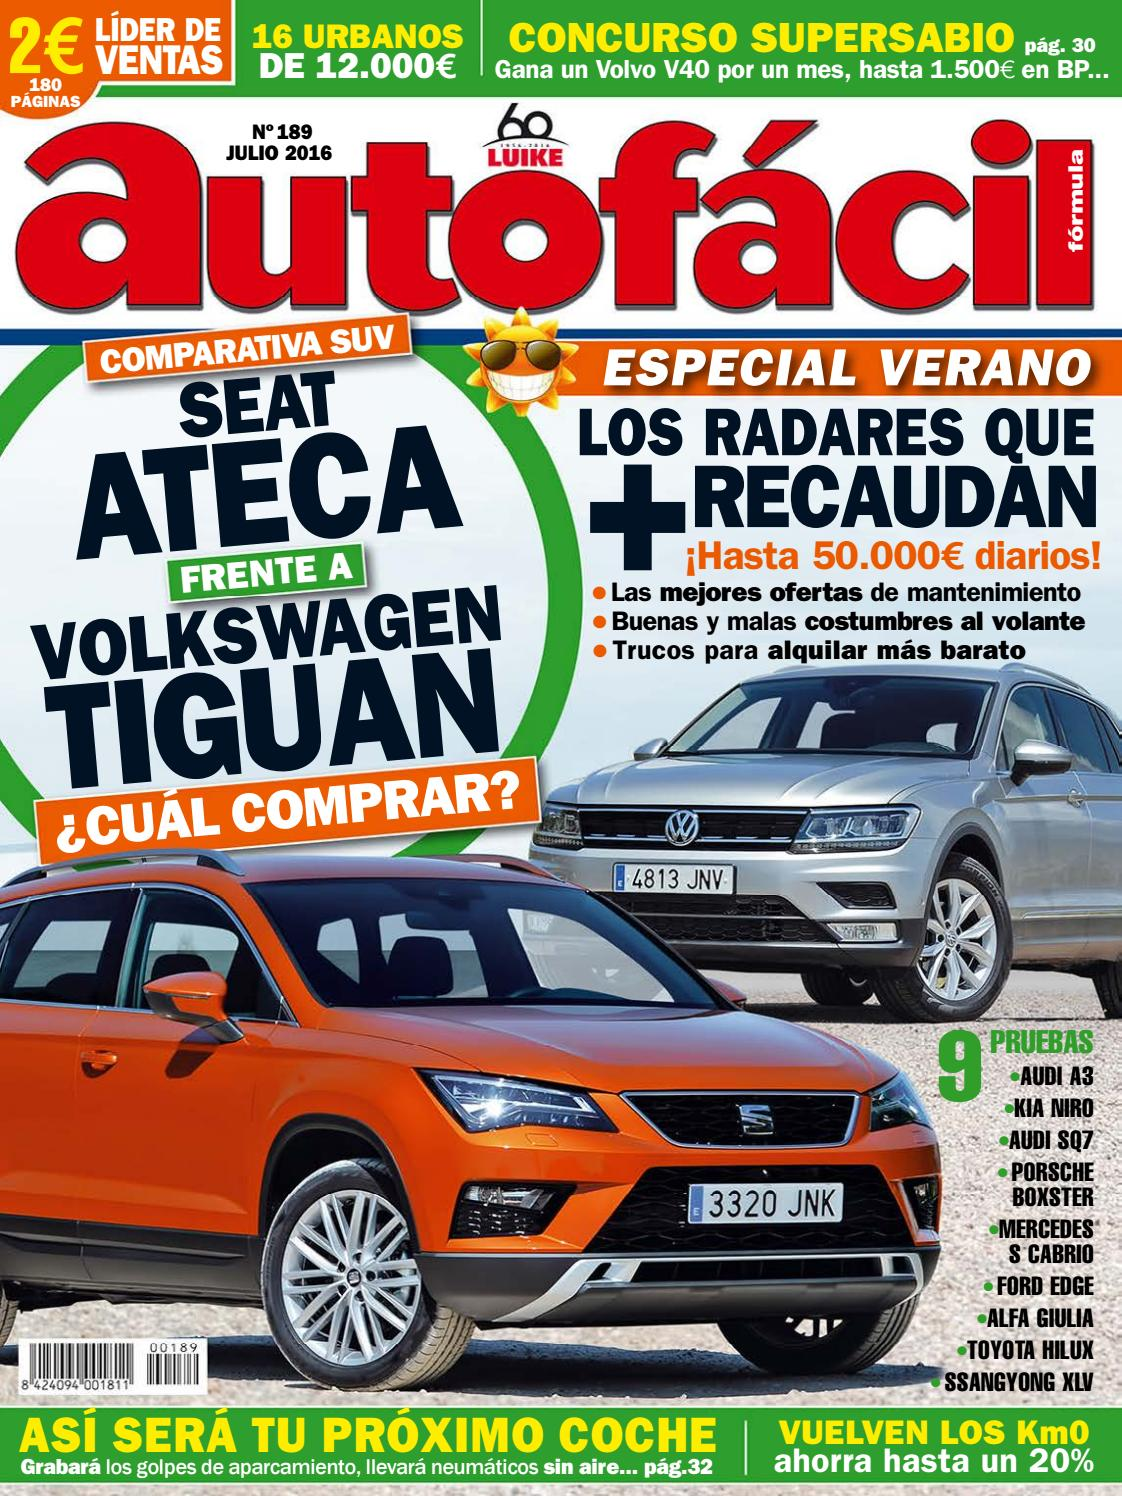 fe89f3b3b8 Autofácil Nº 189. Julio 2016 by LIDER - issuu